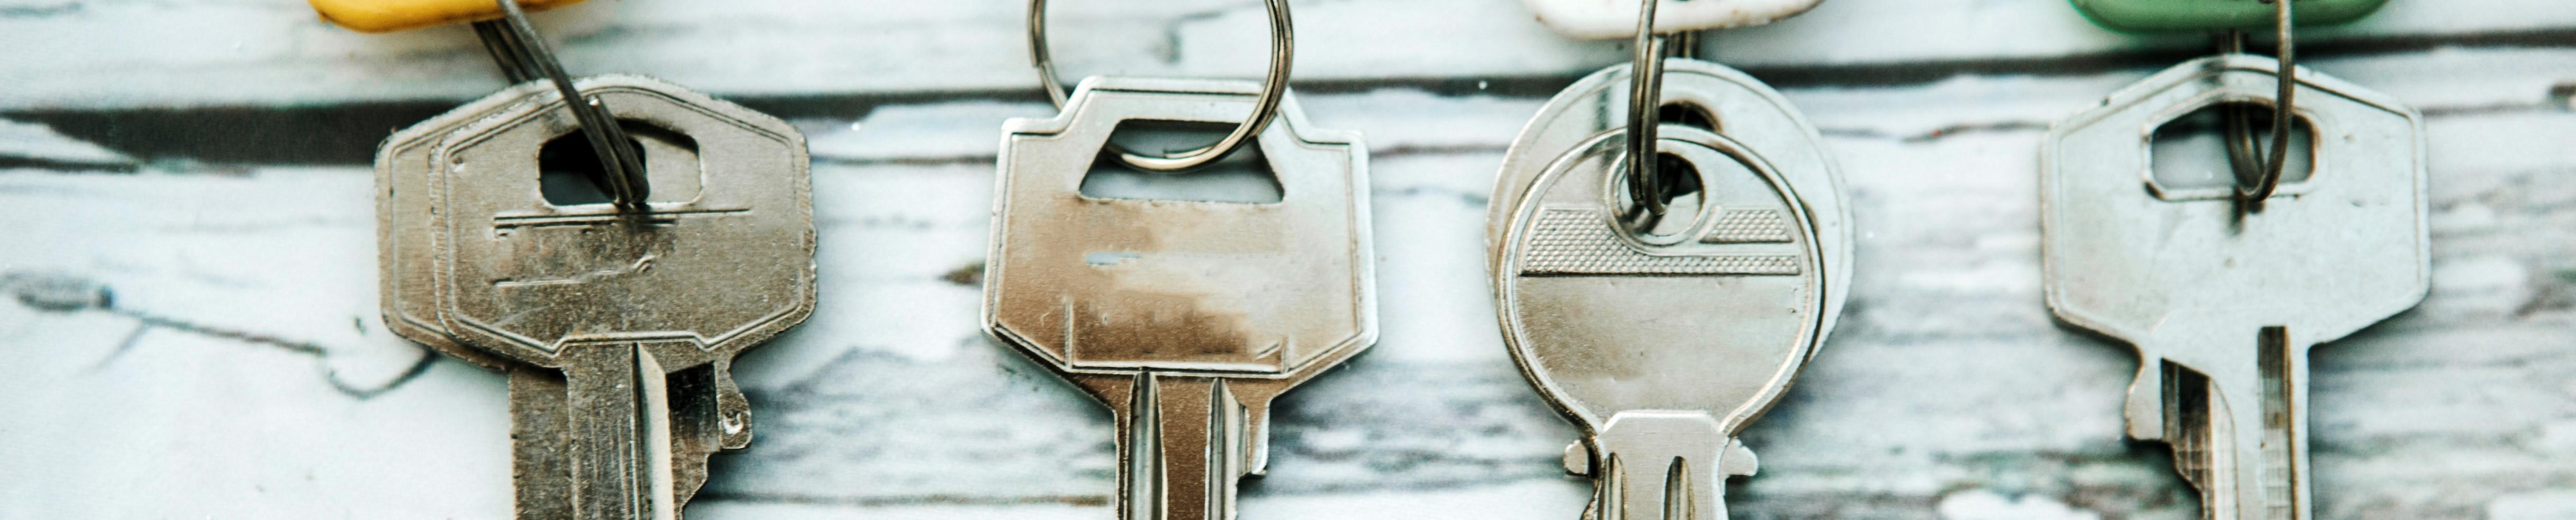 Burglary Ring Targets Property Offices for Master Keys